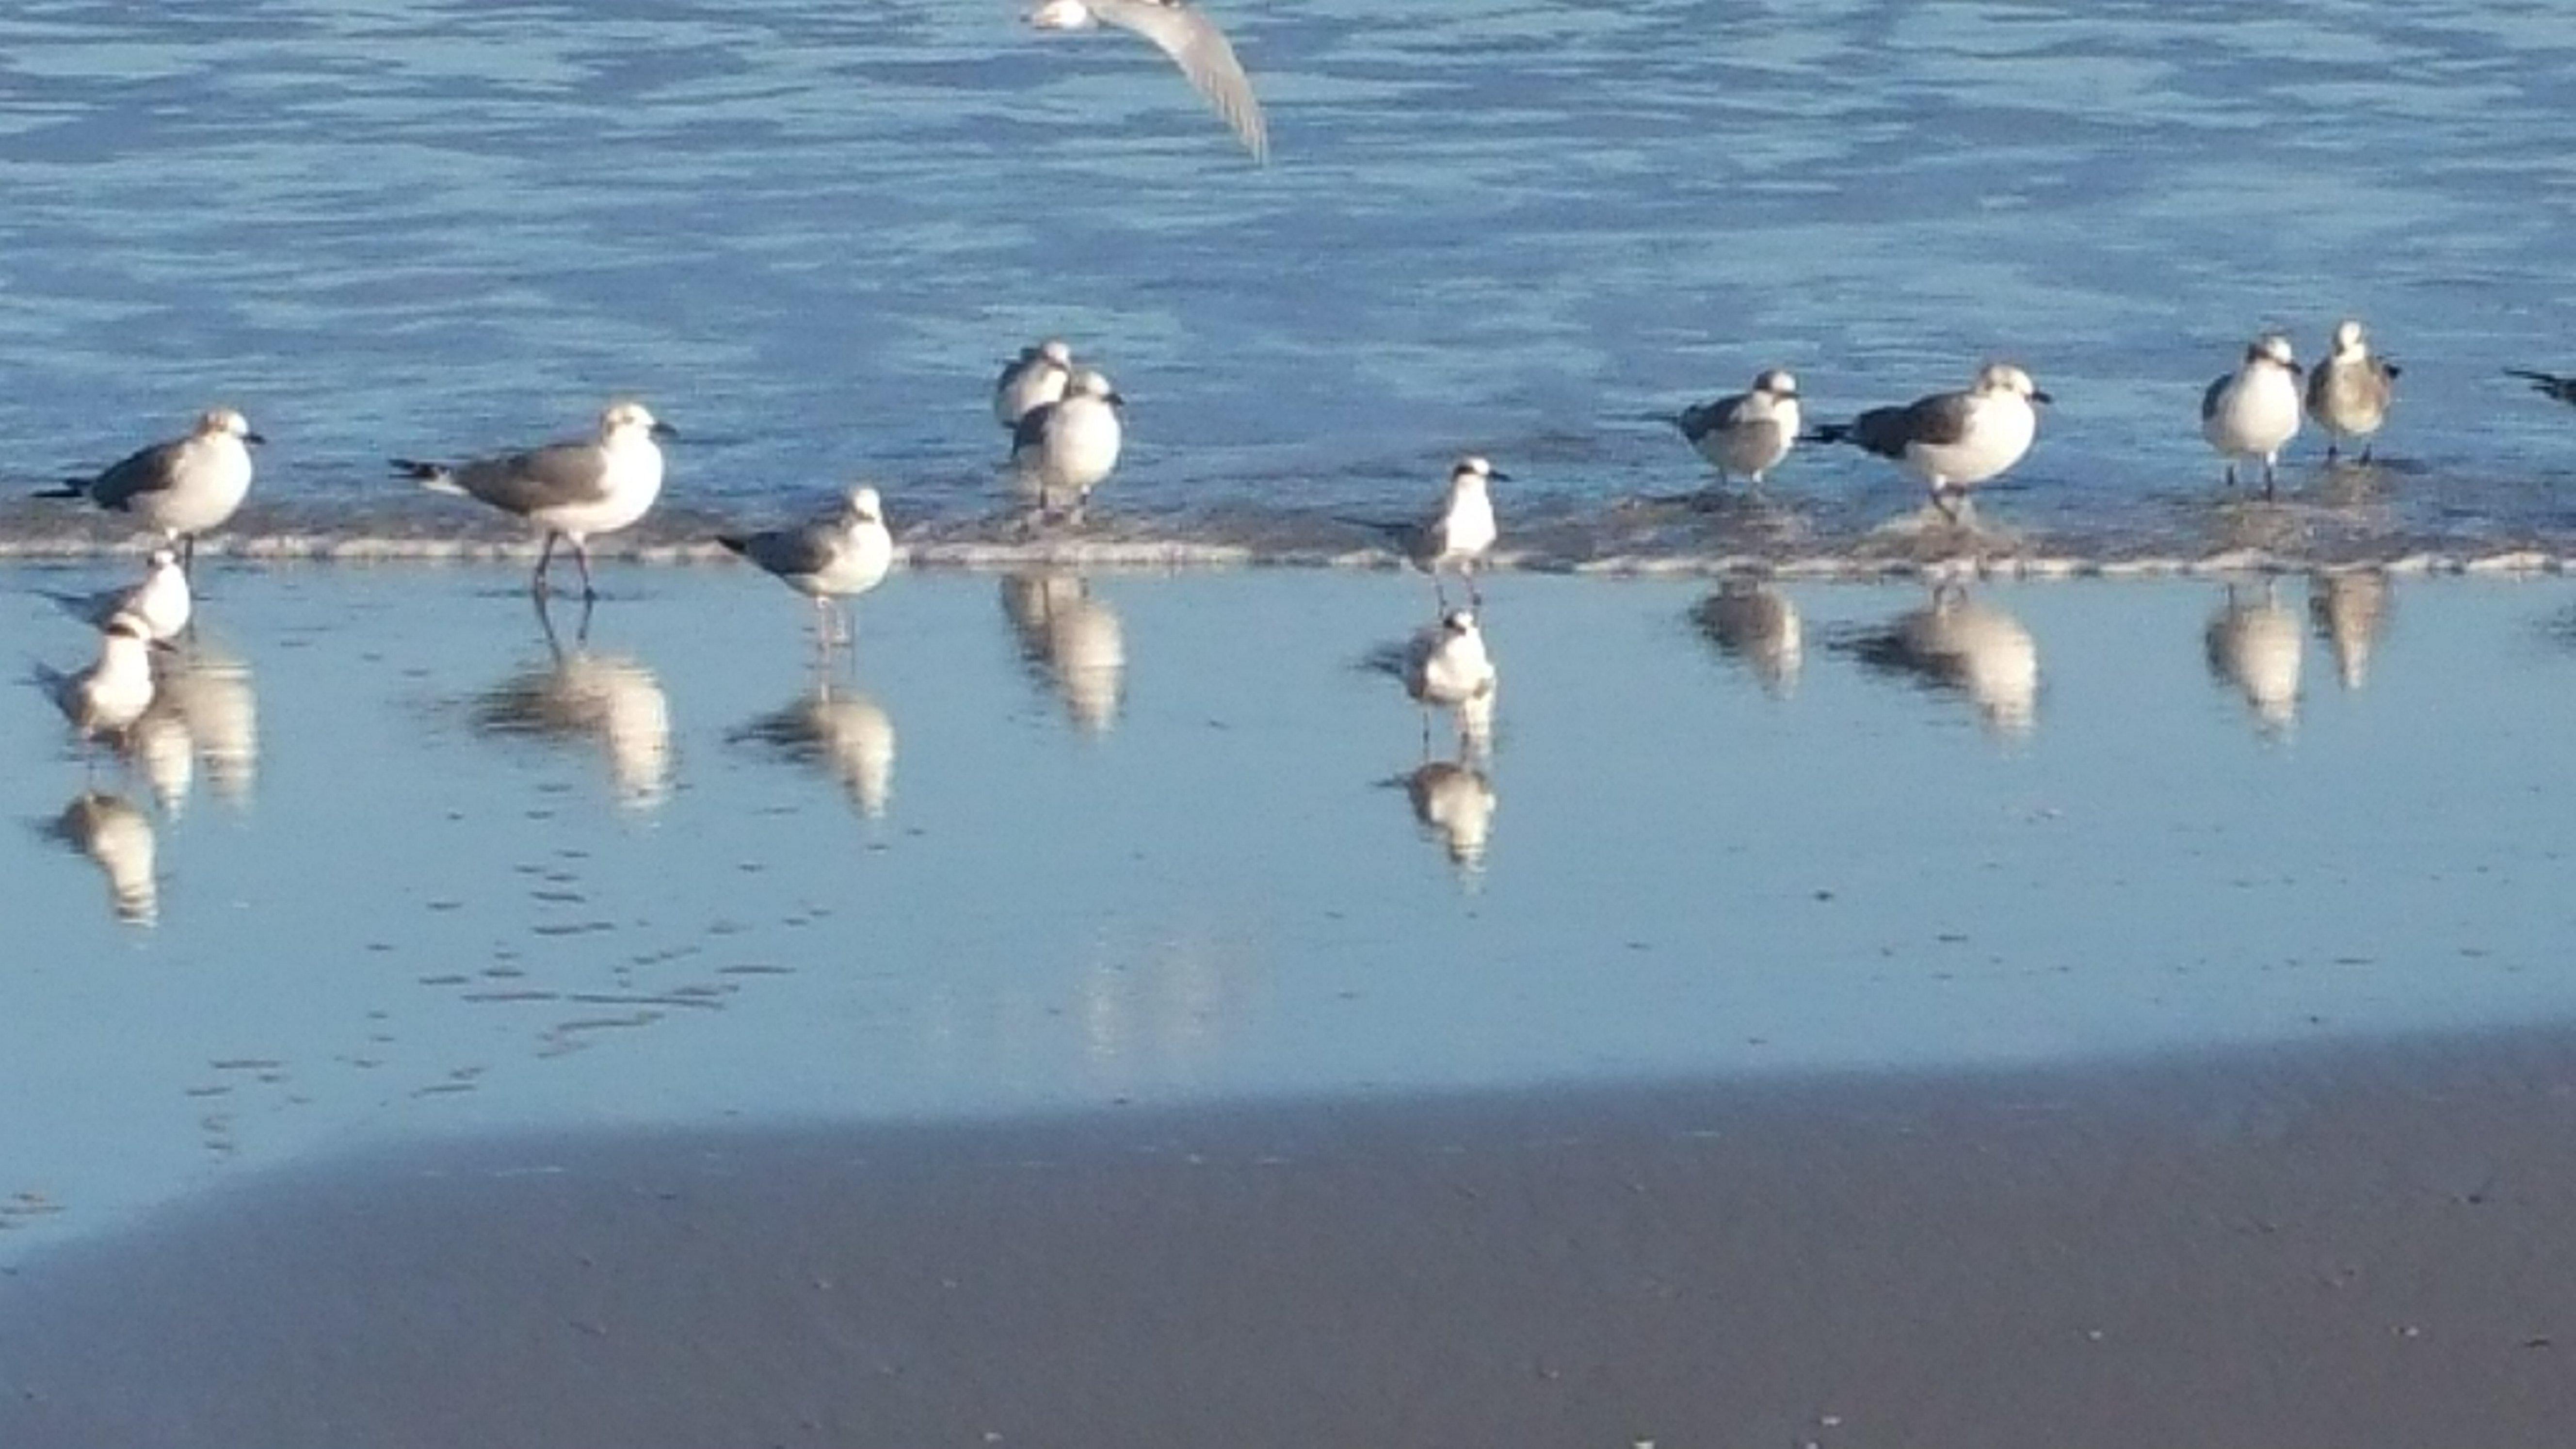 Atlantic Ocean NE Florida Ponte Vedra Beach seagulls